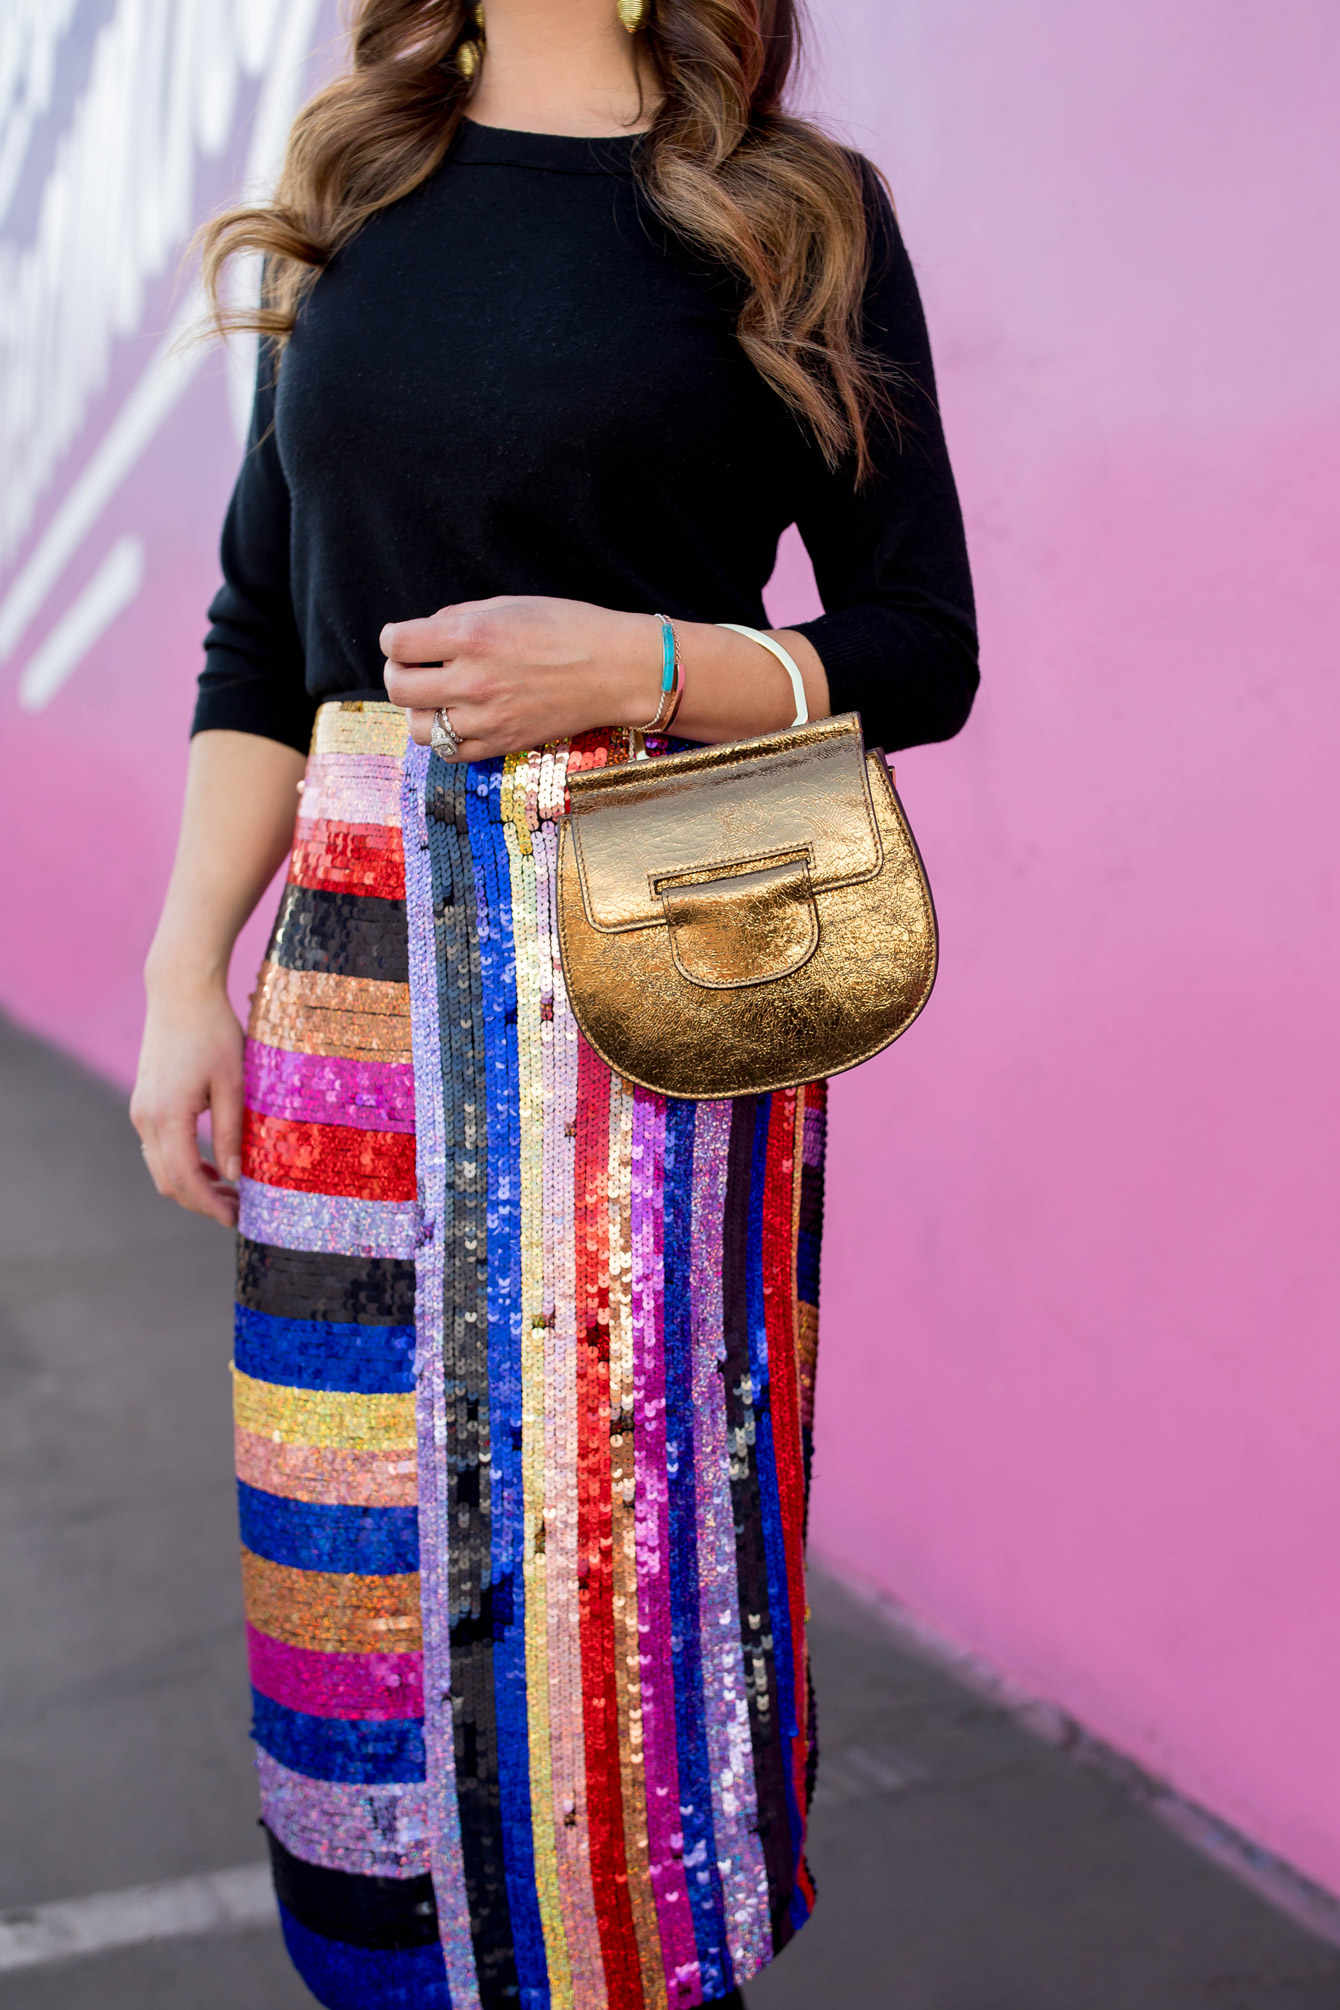 Louise Cie Metallic Bracelet Bag